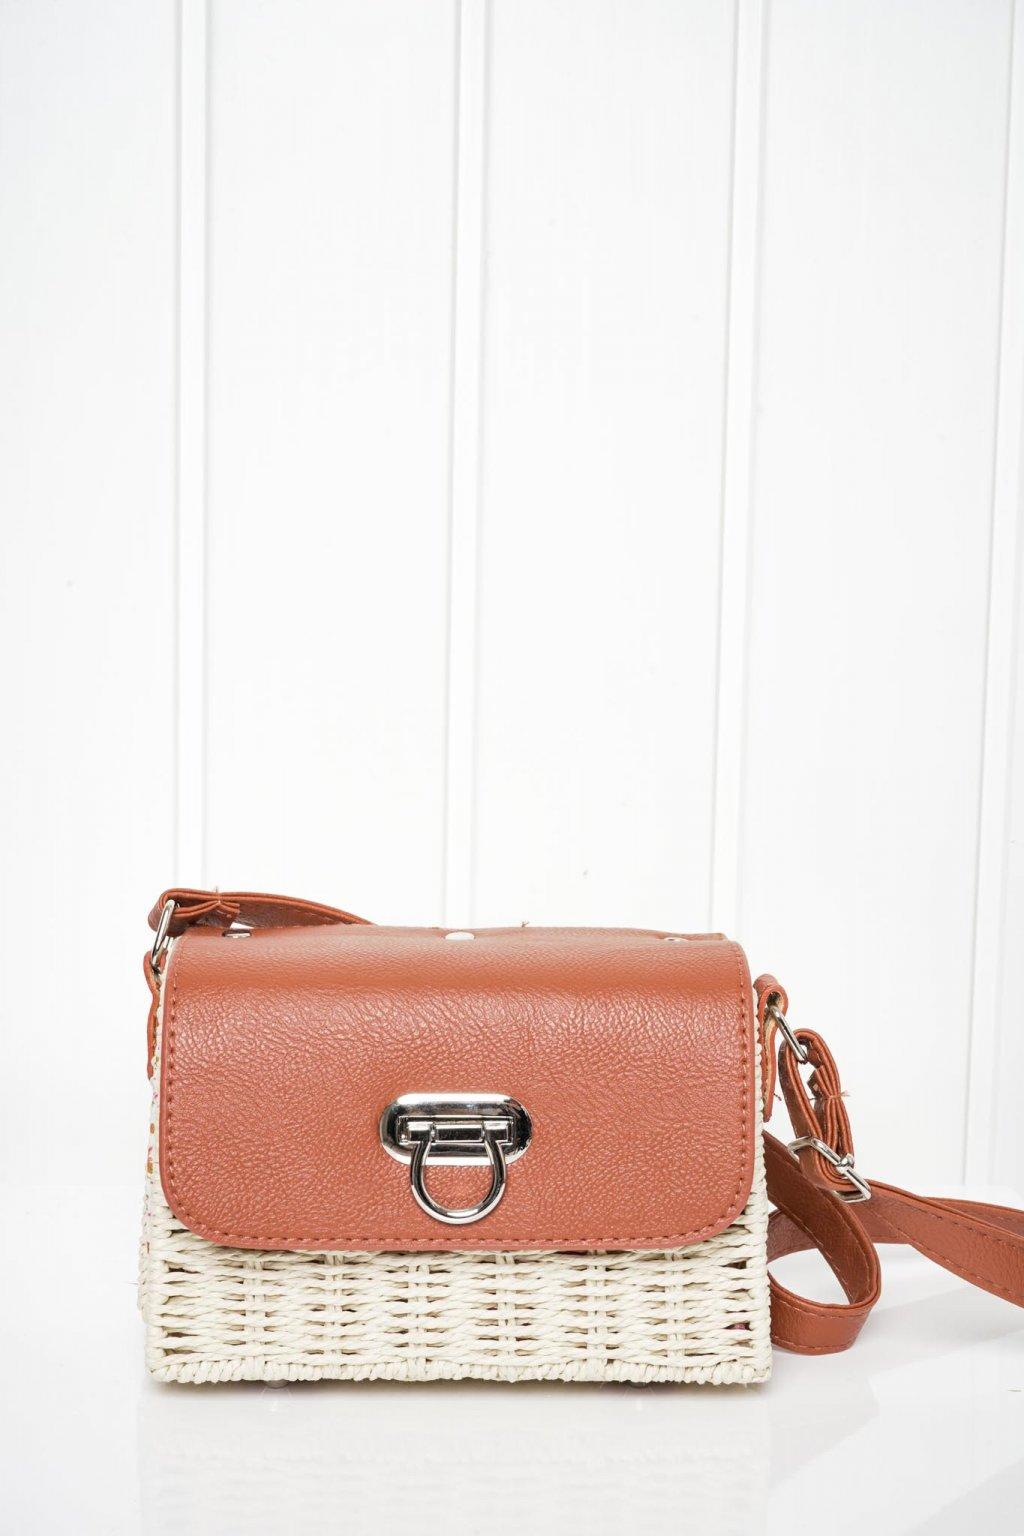 Kabelka, crossbody, ruksak, shopping bag, shopperka, 084